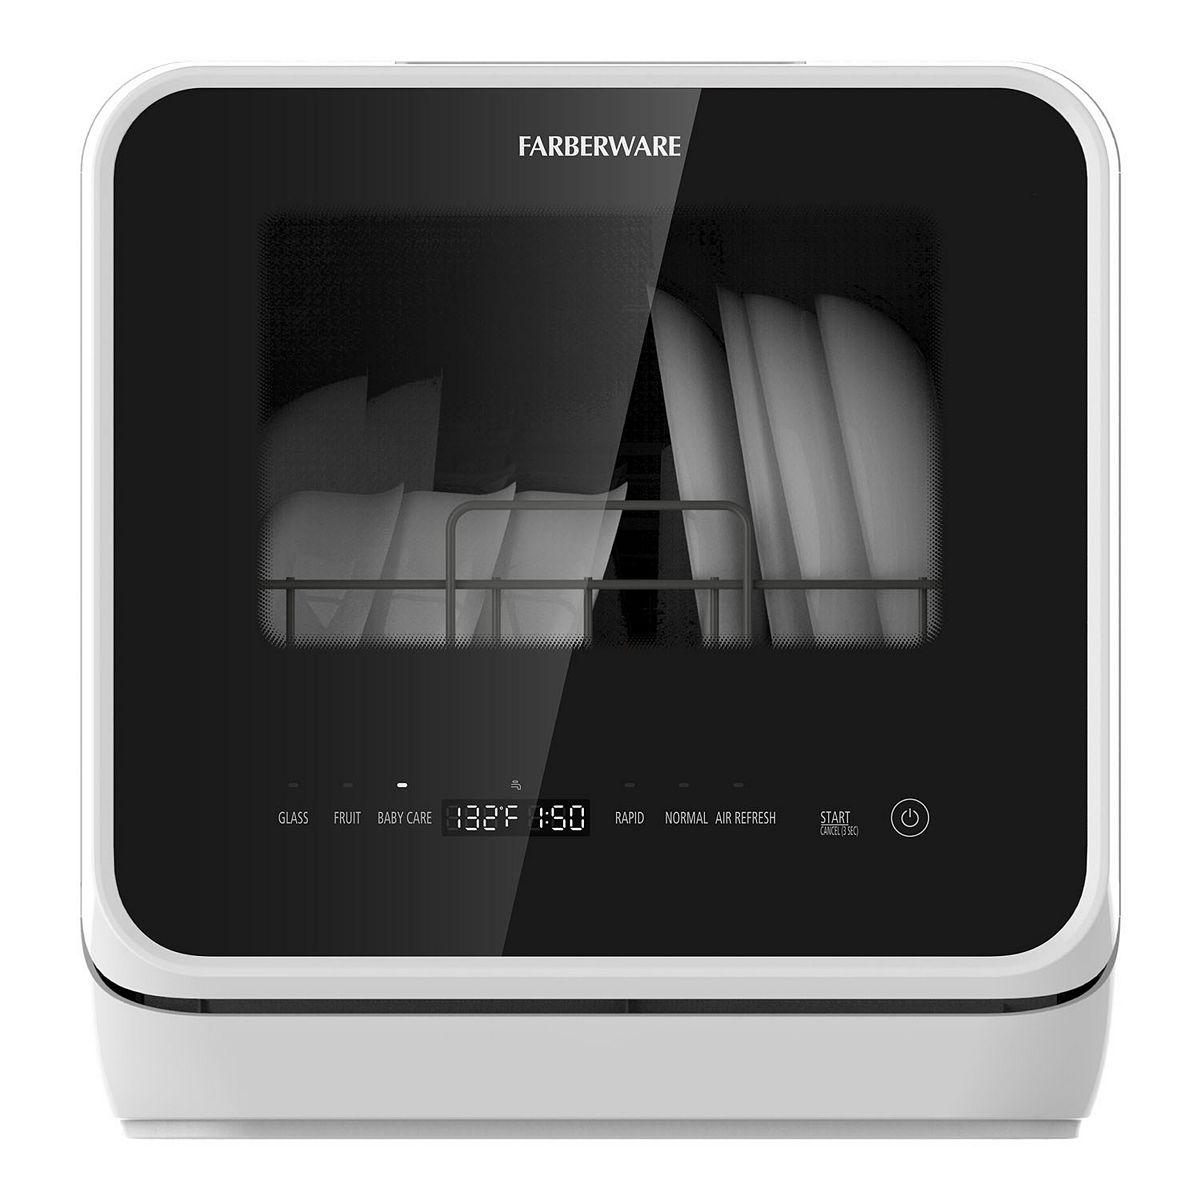 Farberware Compact Portable Countertop Dishwasher + $85 Kohls Rewards